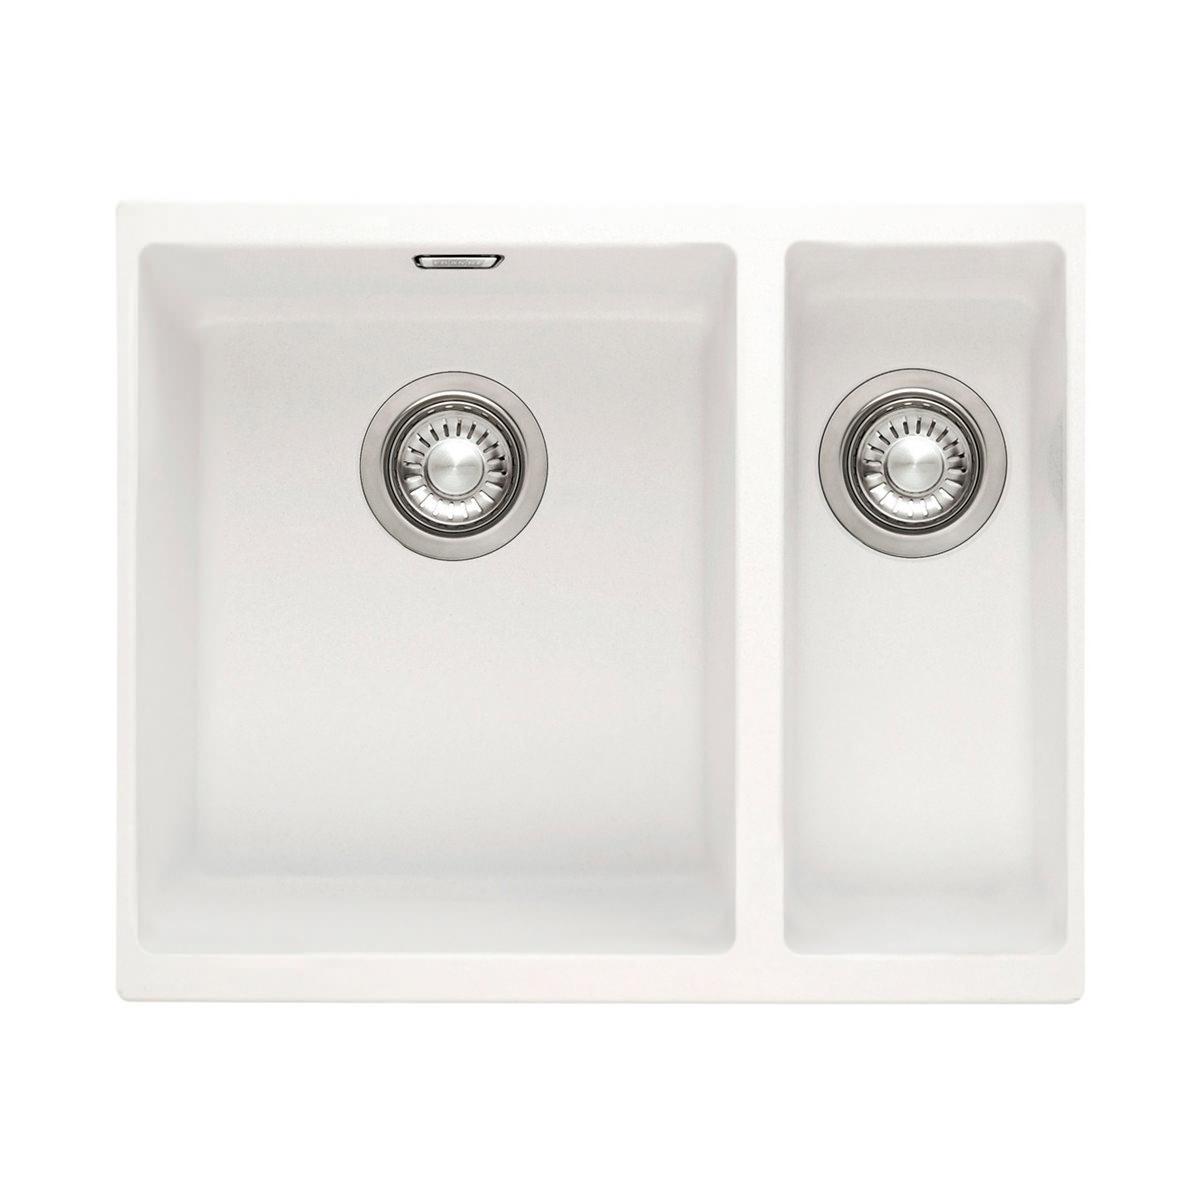 Franke Sirius Sink : Franke Sirius SID 160 White Tectonite 1.5 Bowl Kitchen Undermount Sink ...